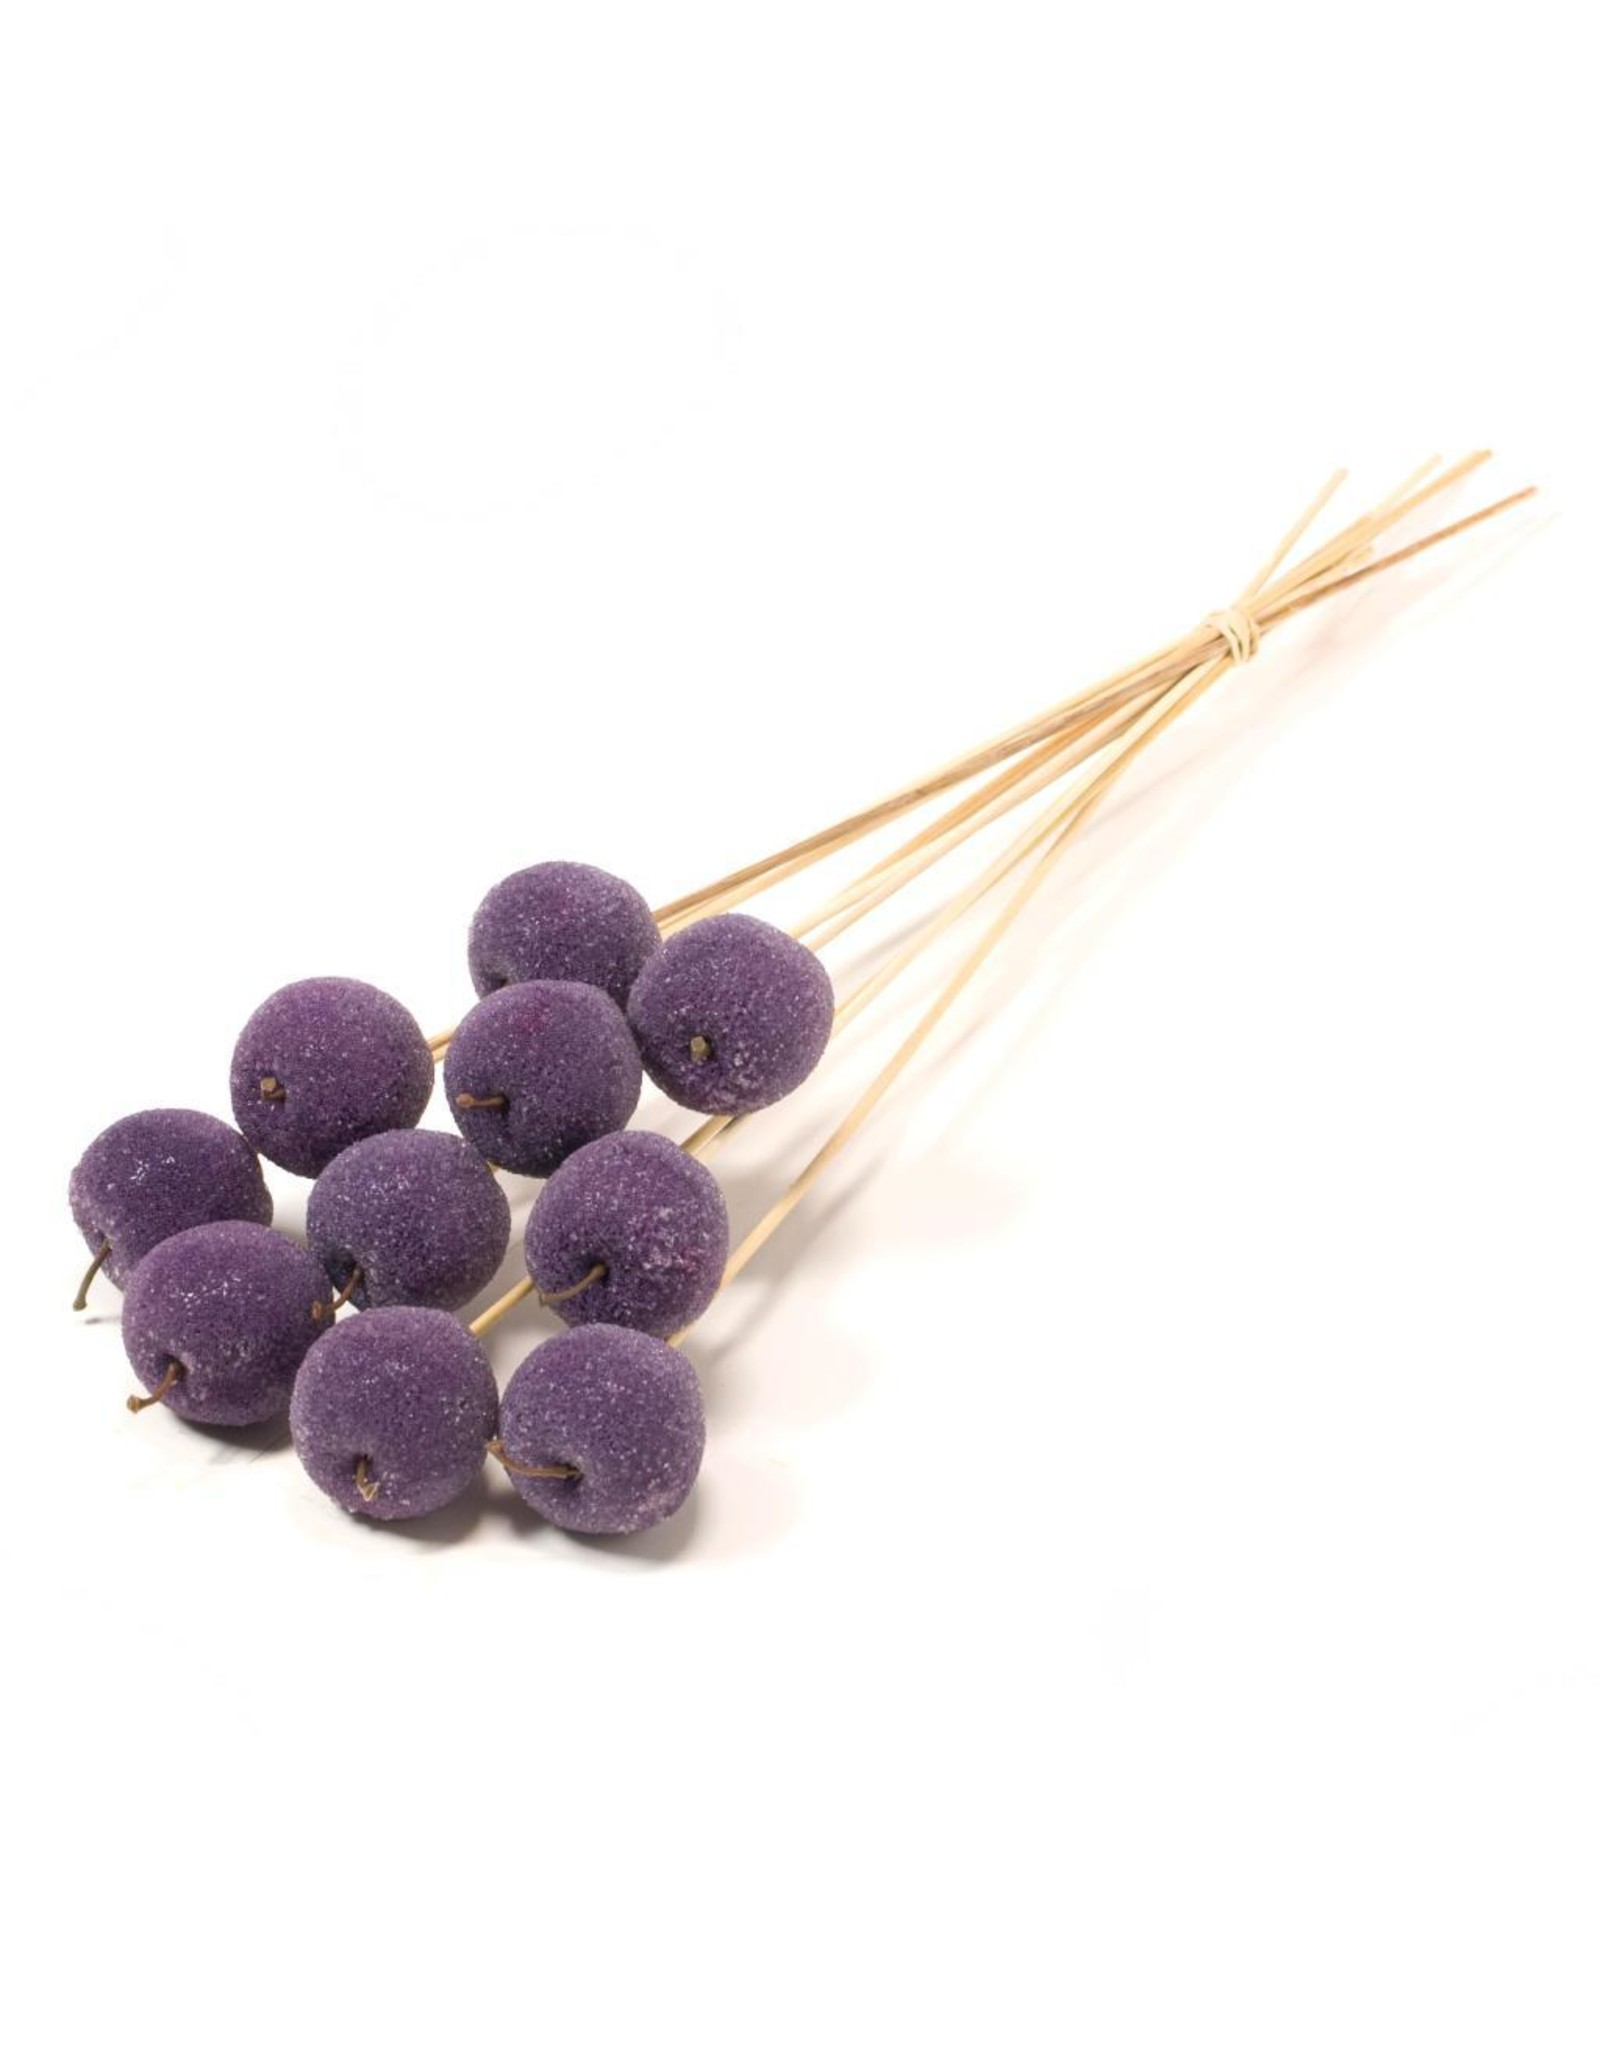 Apple sugar 5cm o/s SB purple x 4